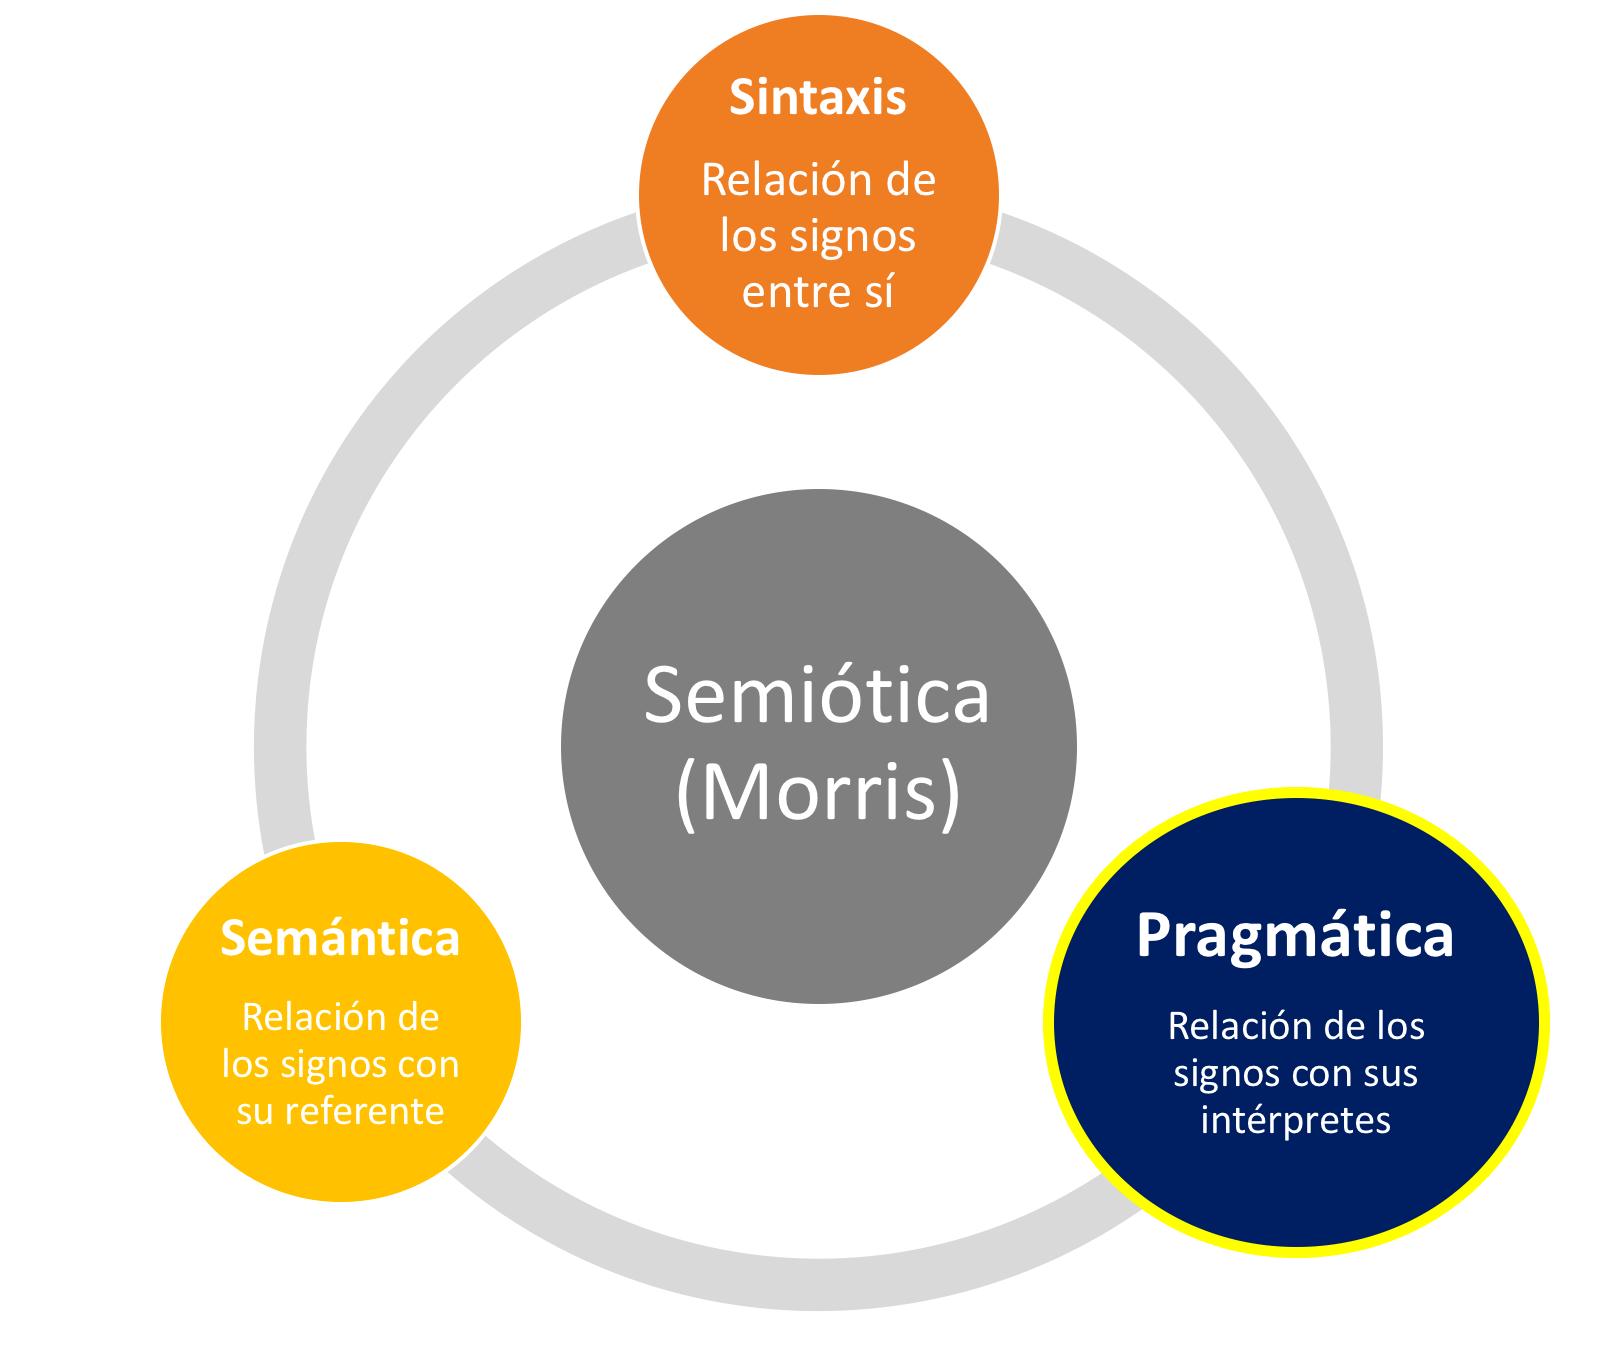 La Pragmática en la Semiótica de Morris – Pragmática UBU